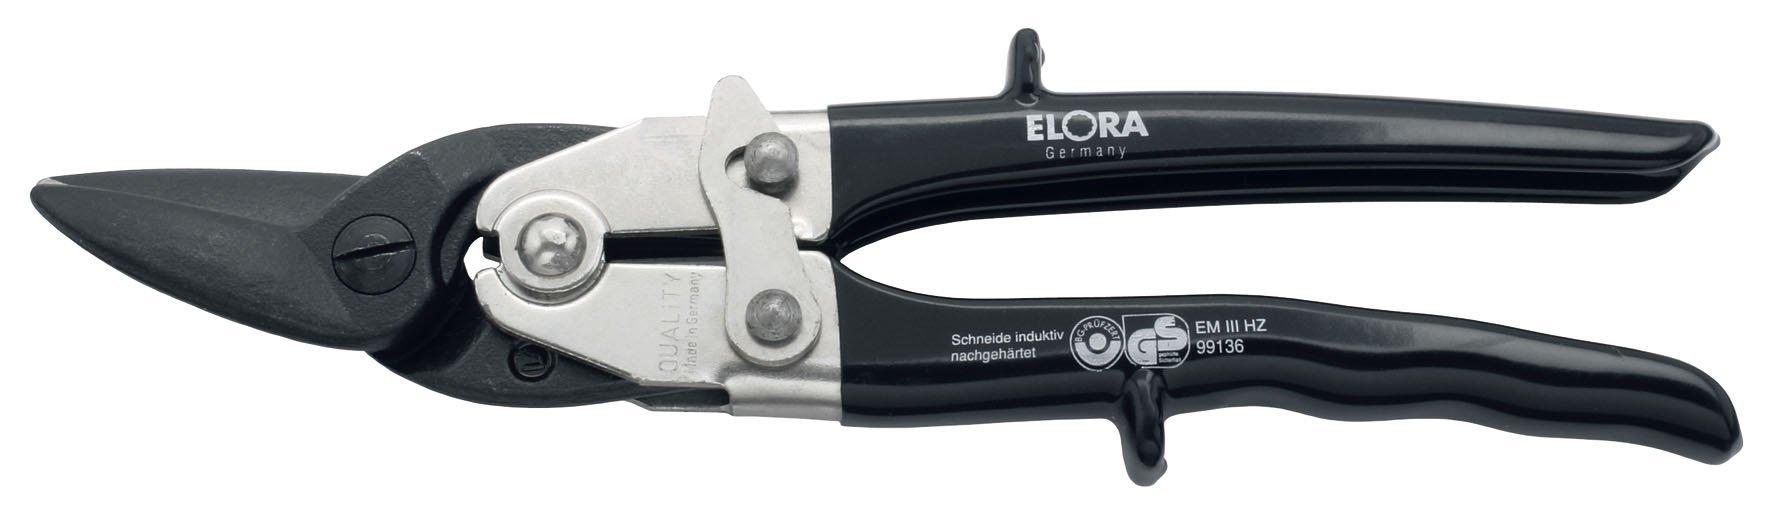 Elora 483000016000 Shape Cutting Lever Tin Snip left 483L